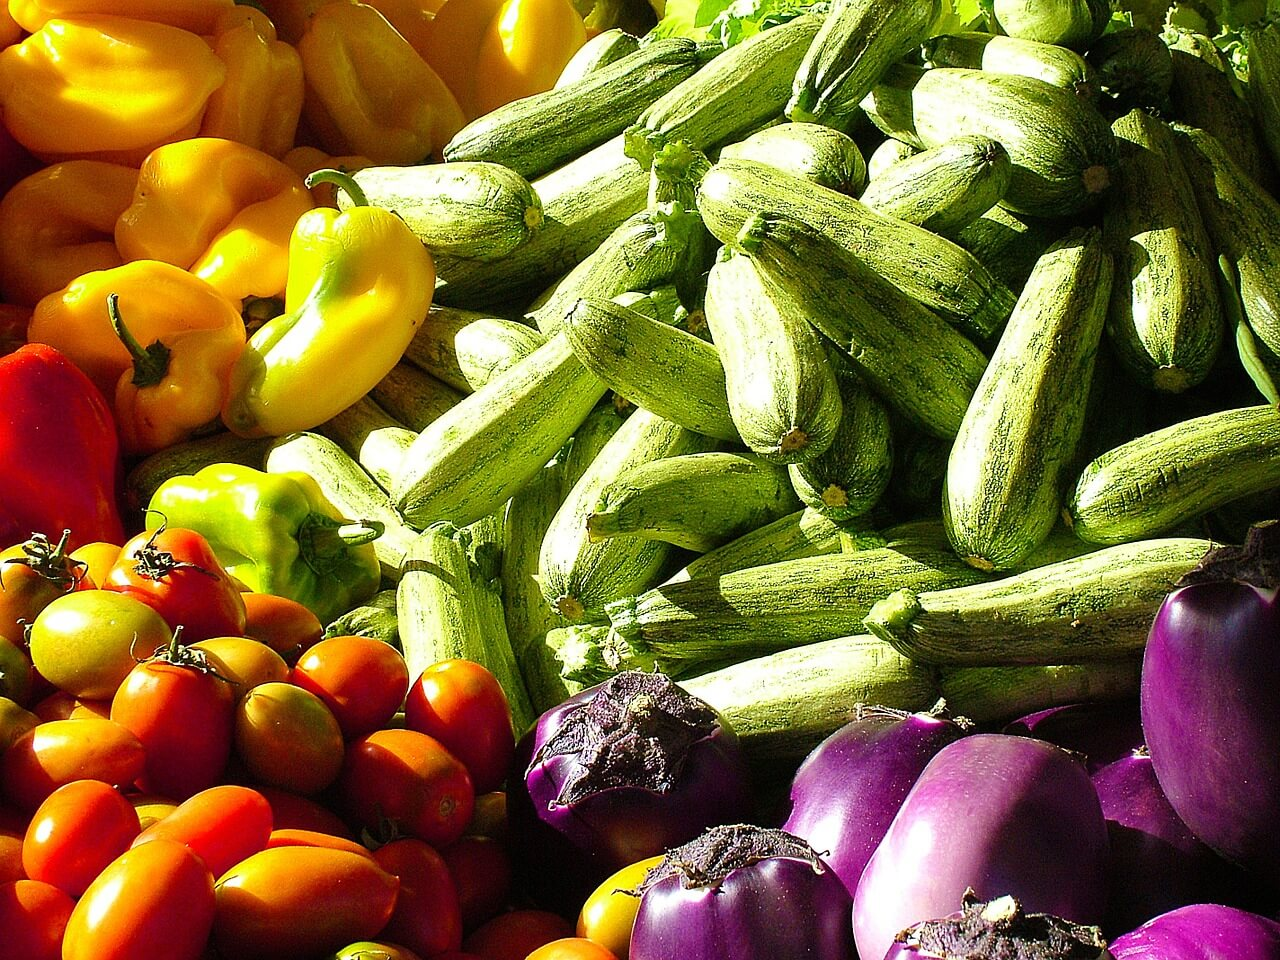 jak-dusic-mieso-warzywa